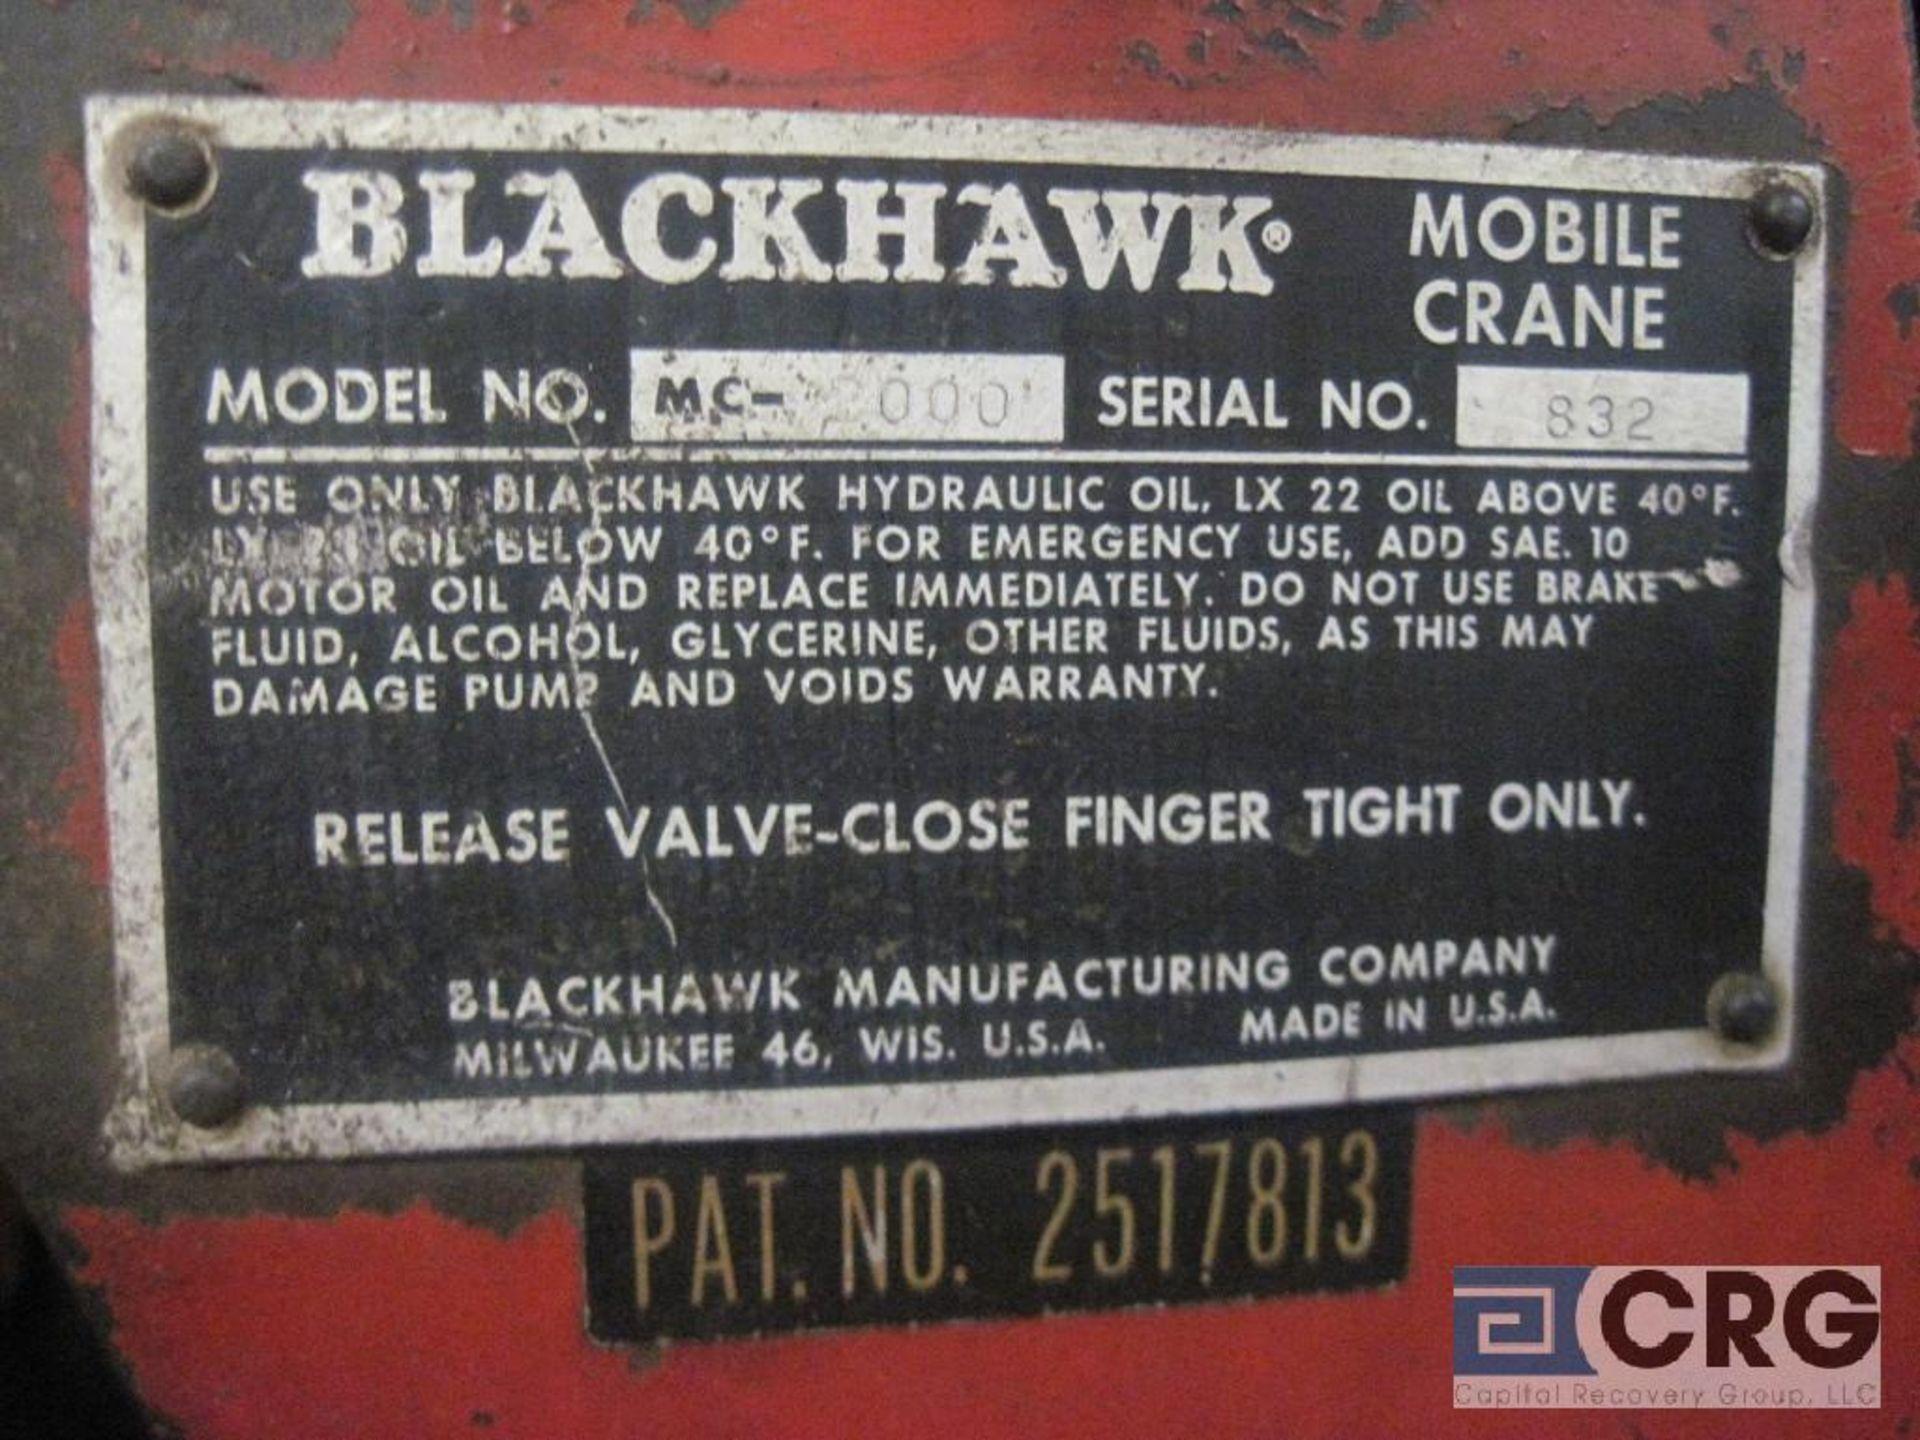 Black Hawk MC 2000 hydraulic hoist, 1 ton cap., s/n 832 - Image 2 of 2